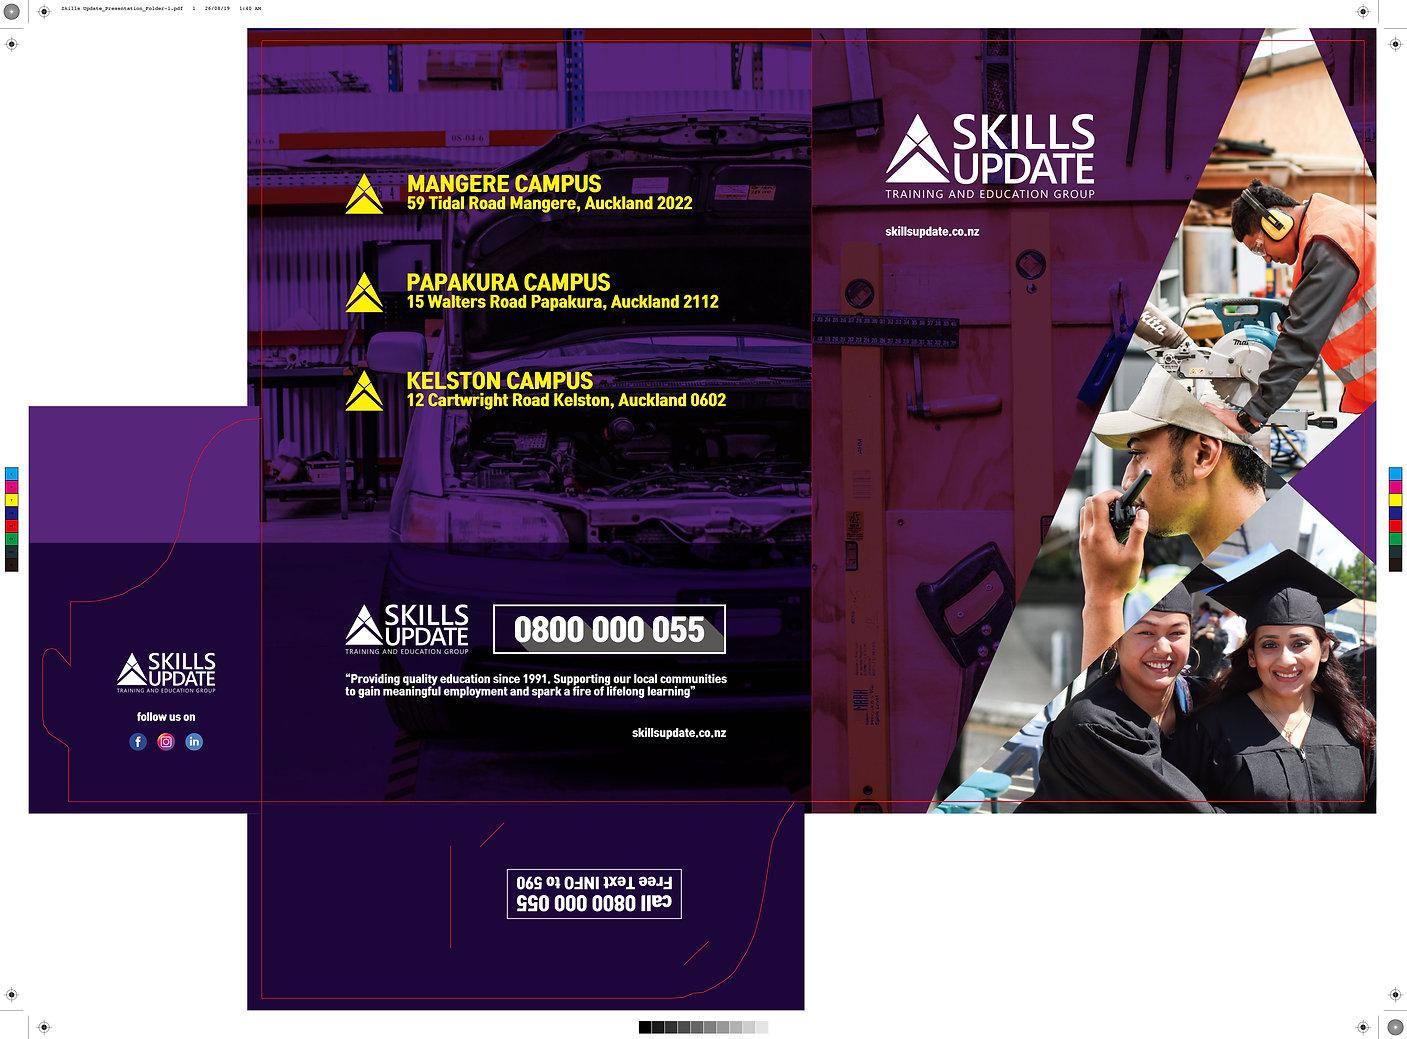 Skills-Update_Presentation_Folder-1.jpg